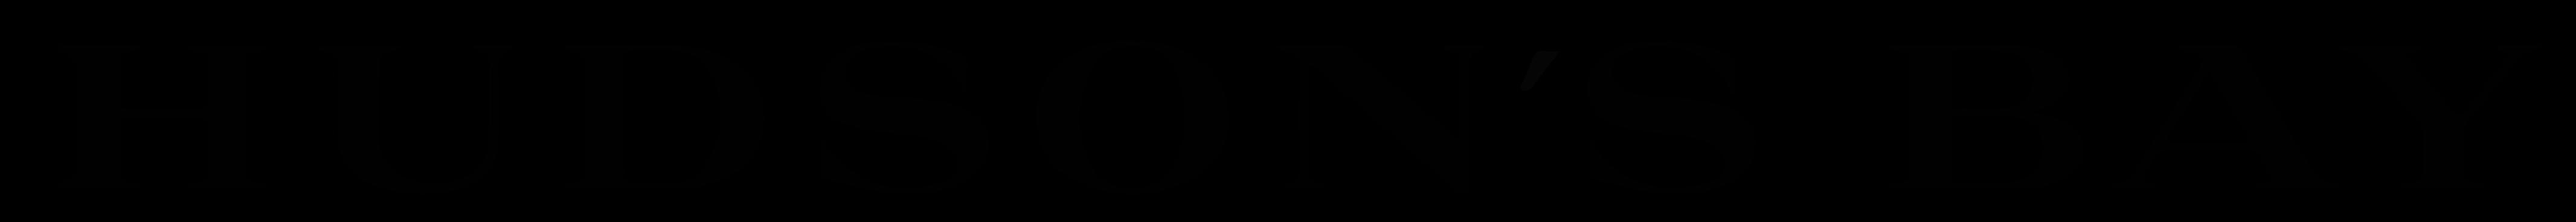 Hudsons_Bay_logo